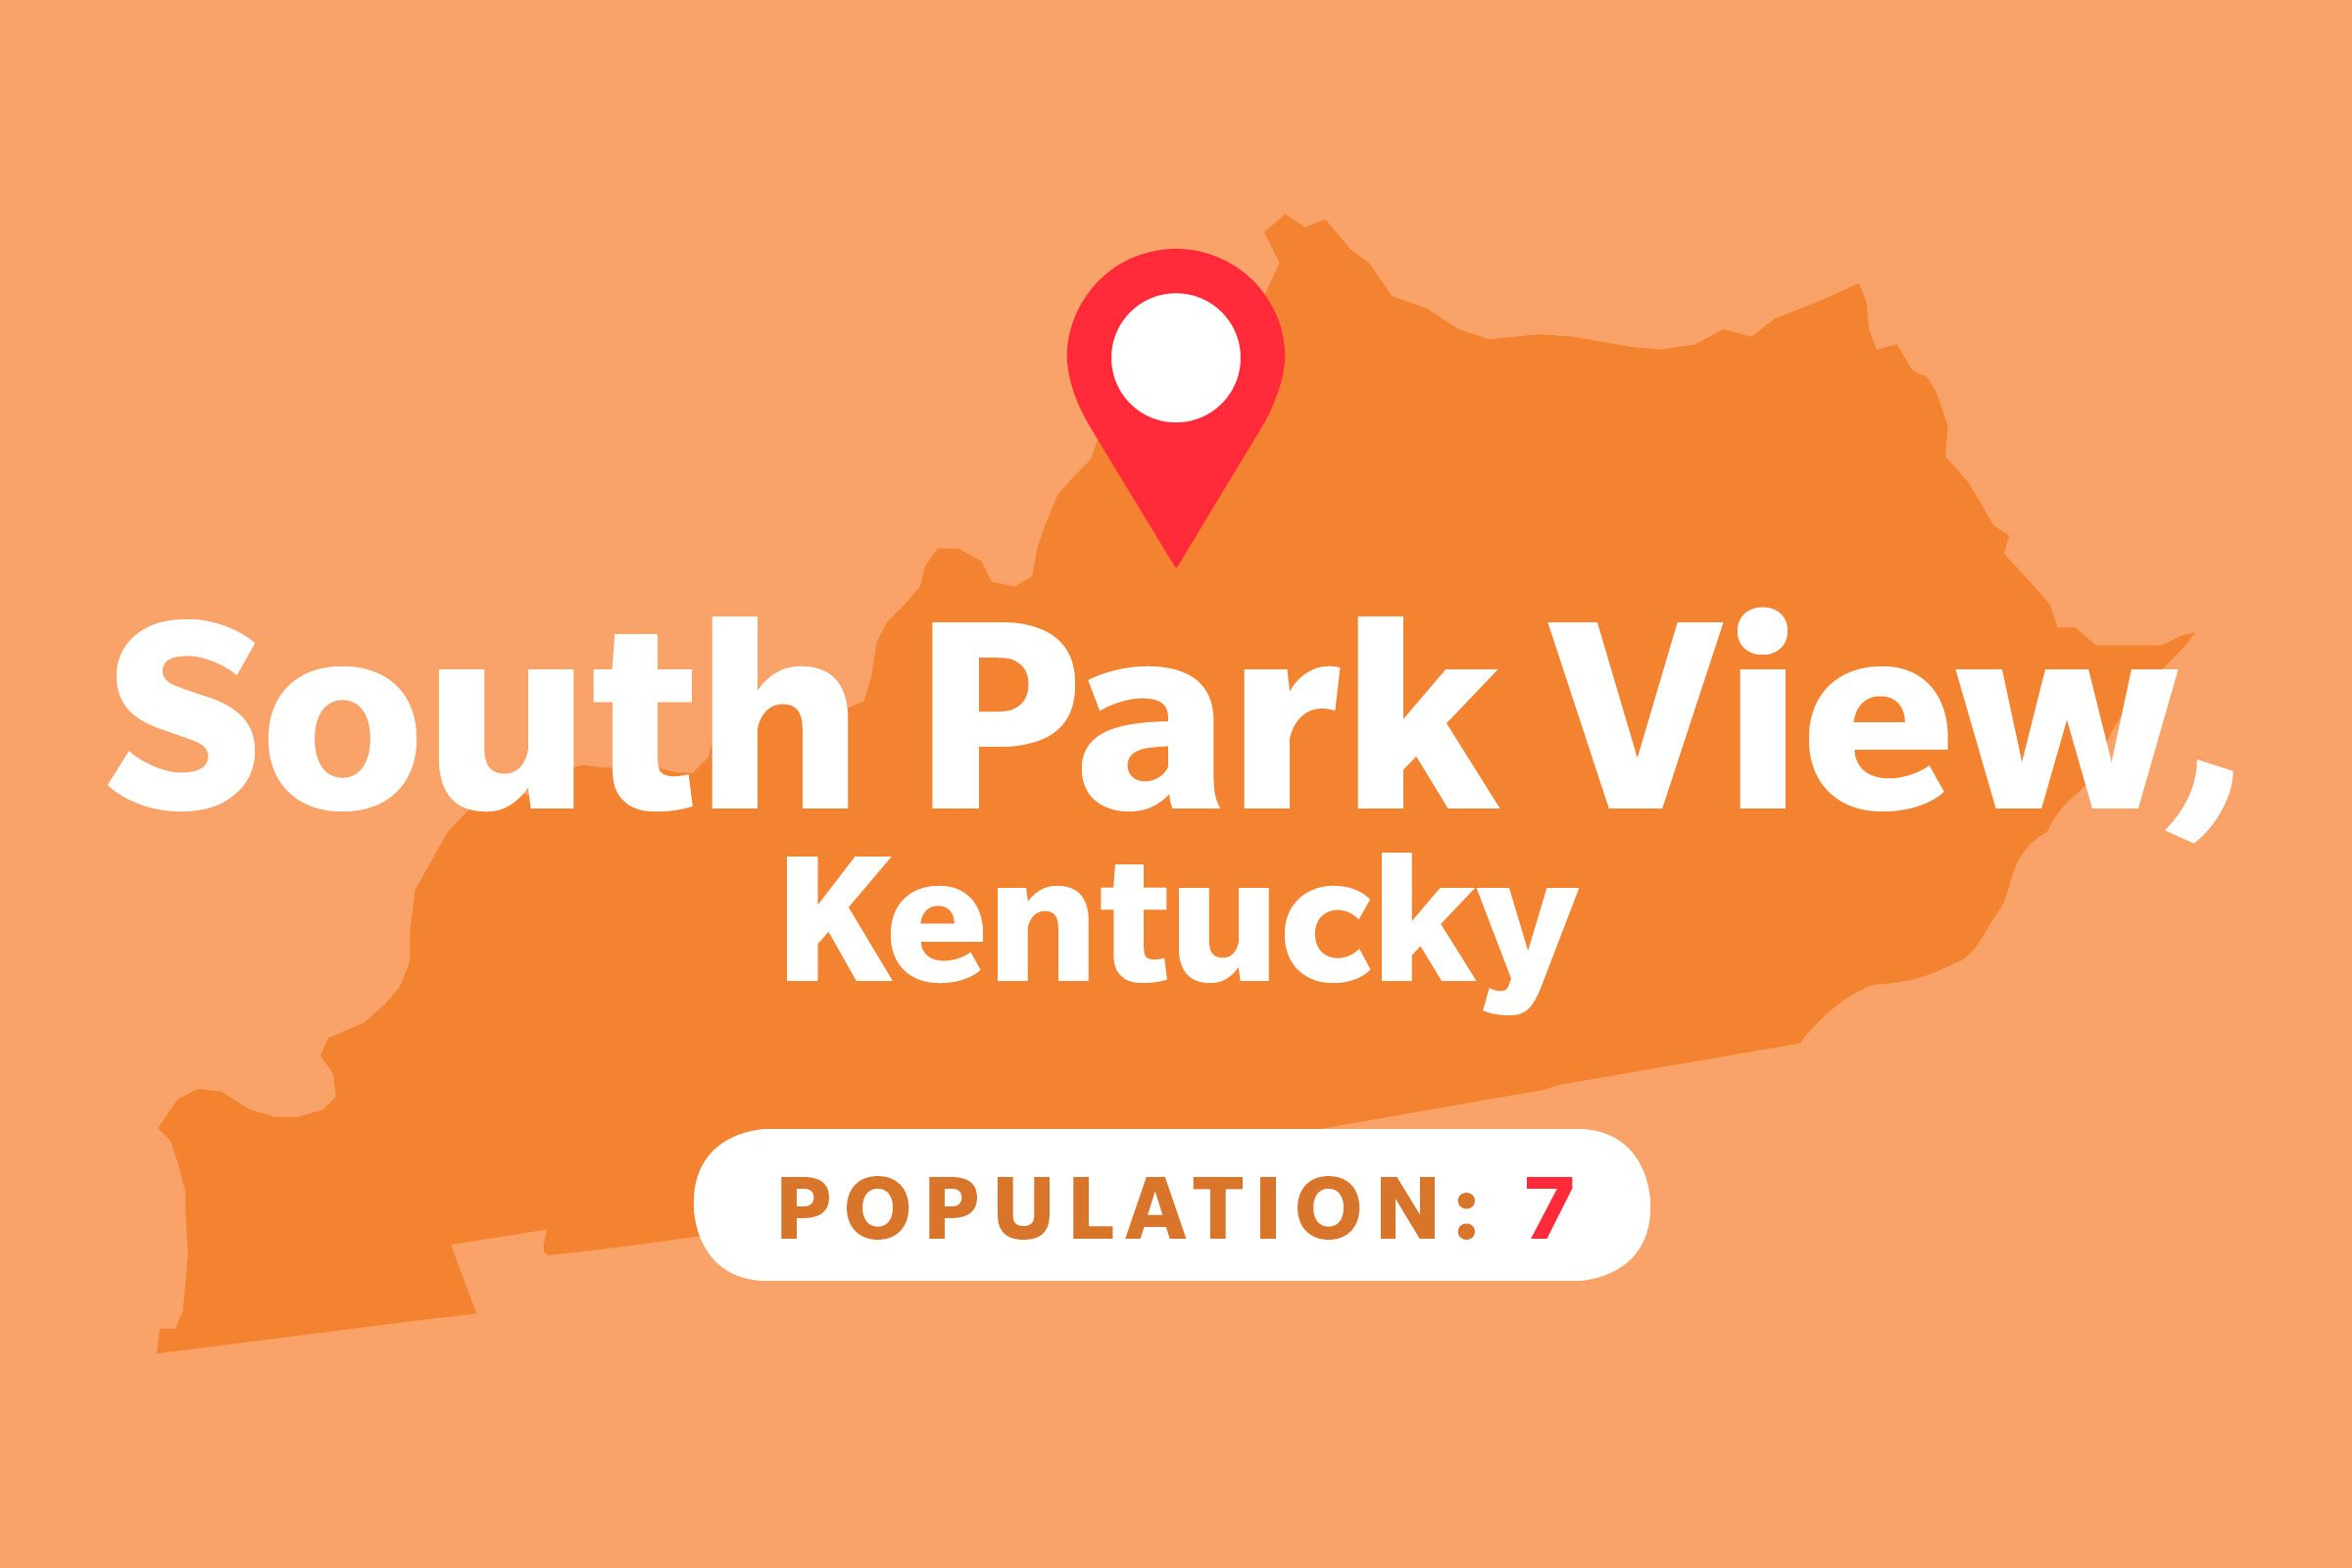 South Park View, Kentucky